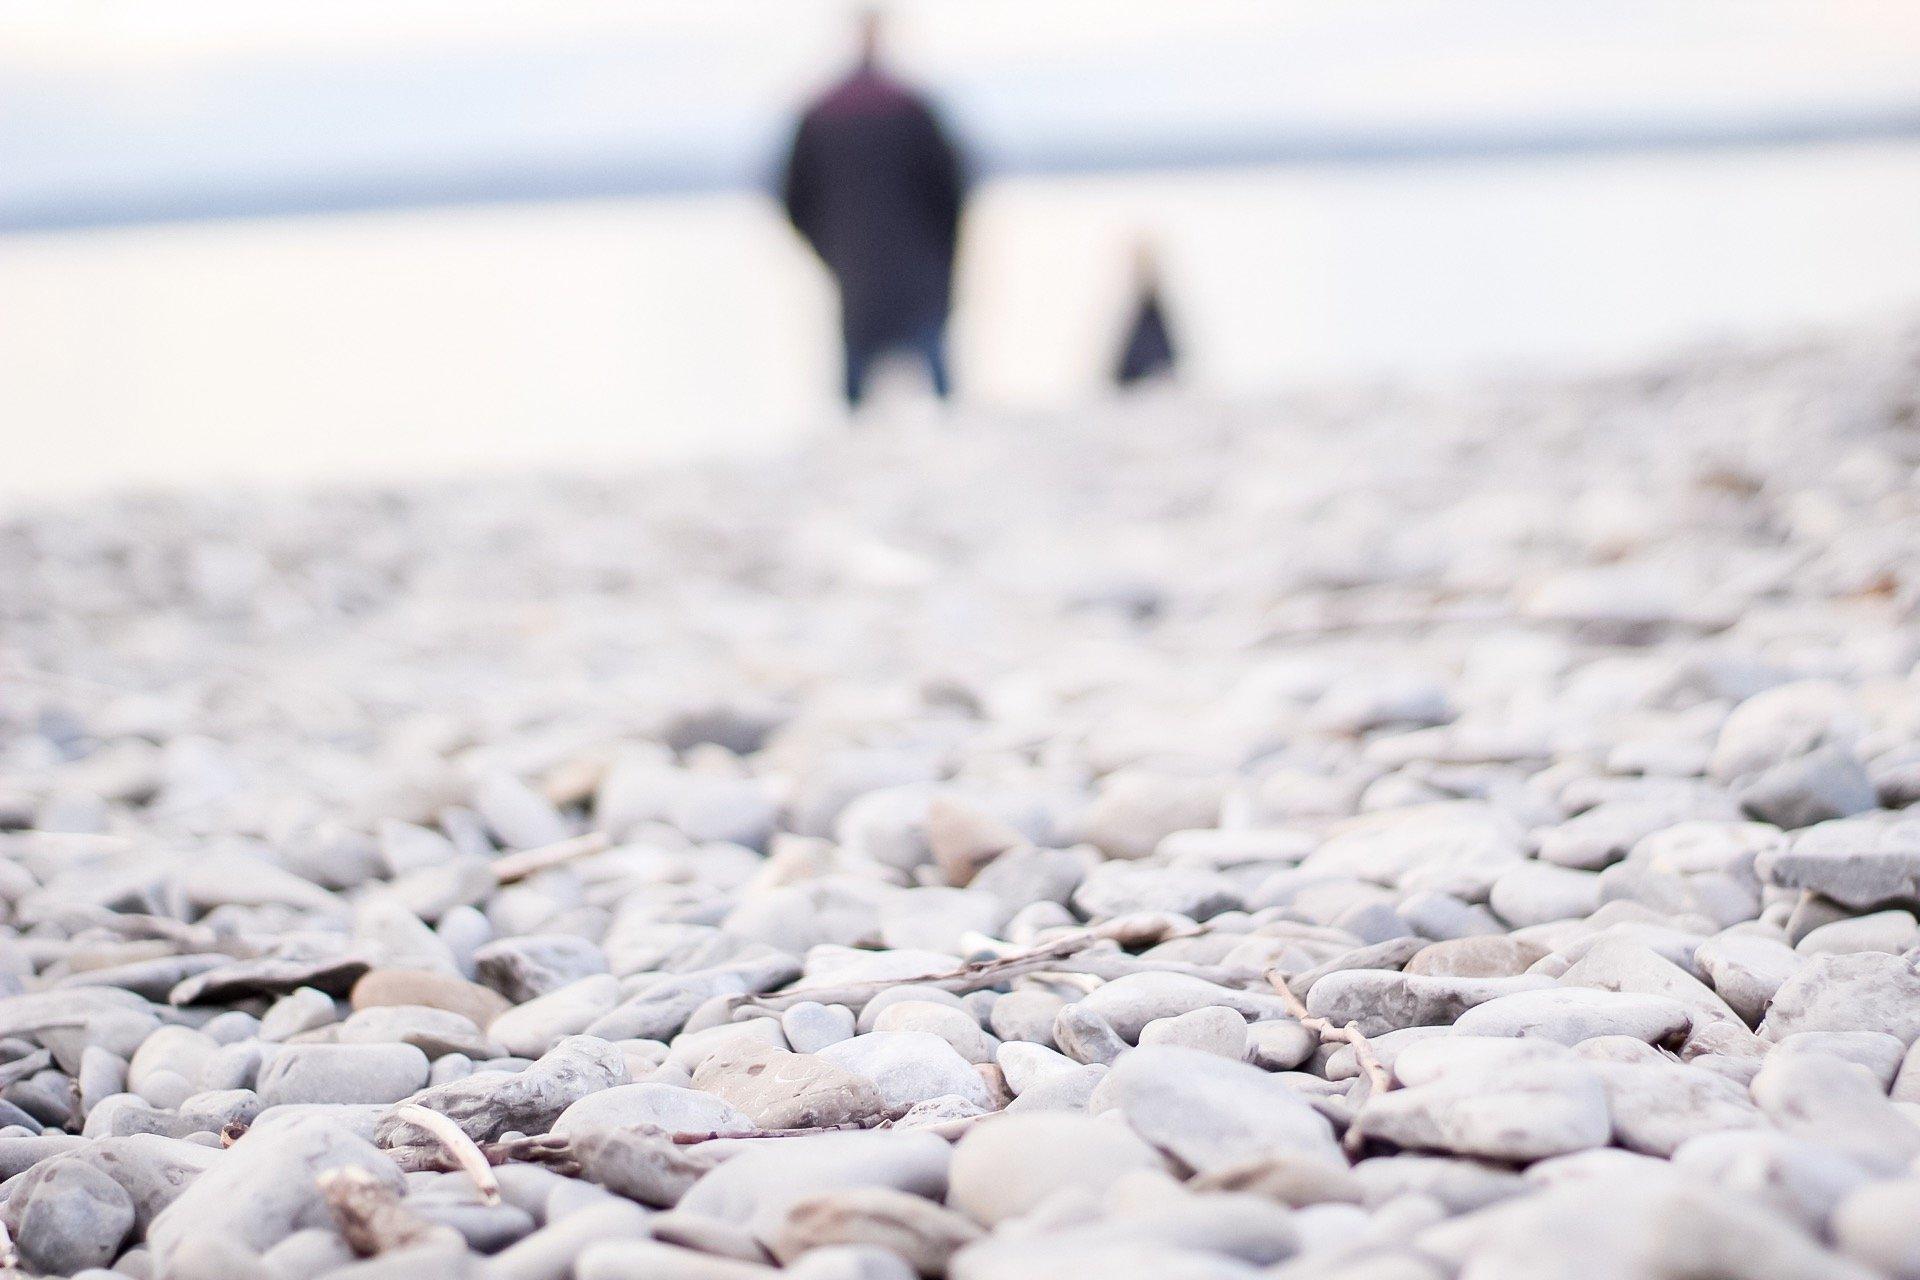 stone beach petoskey mi